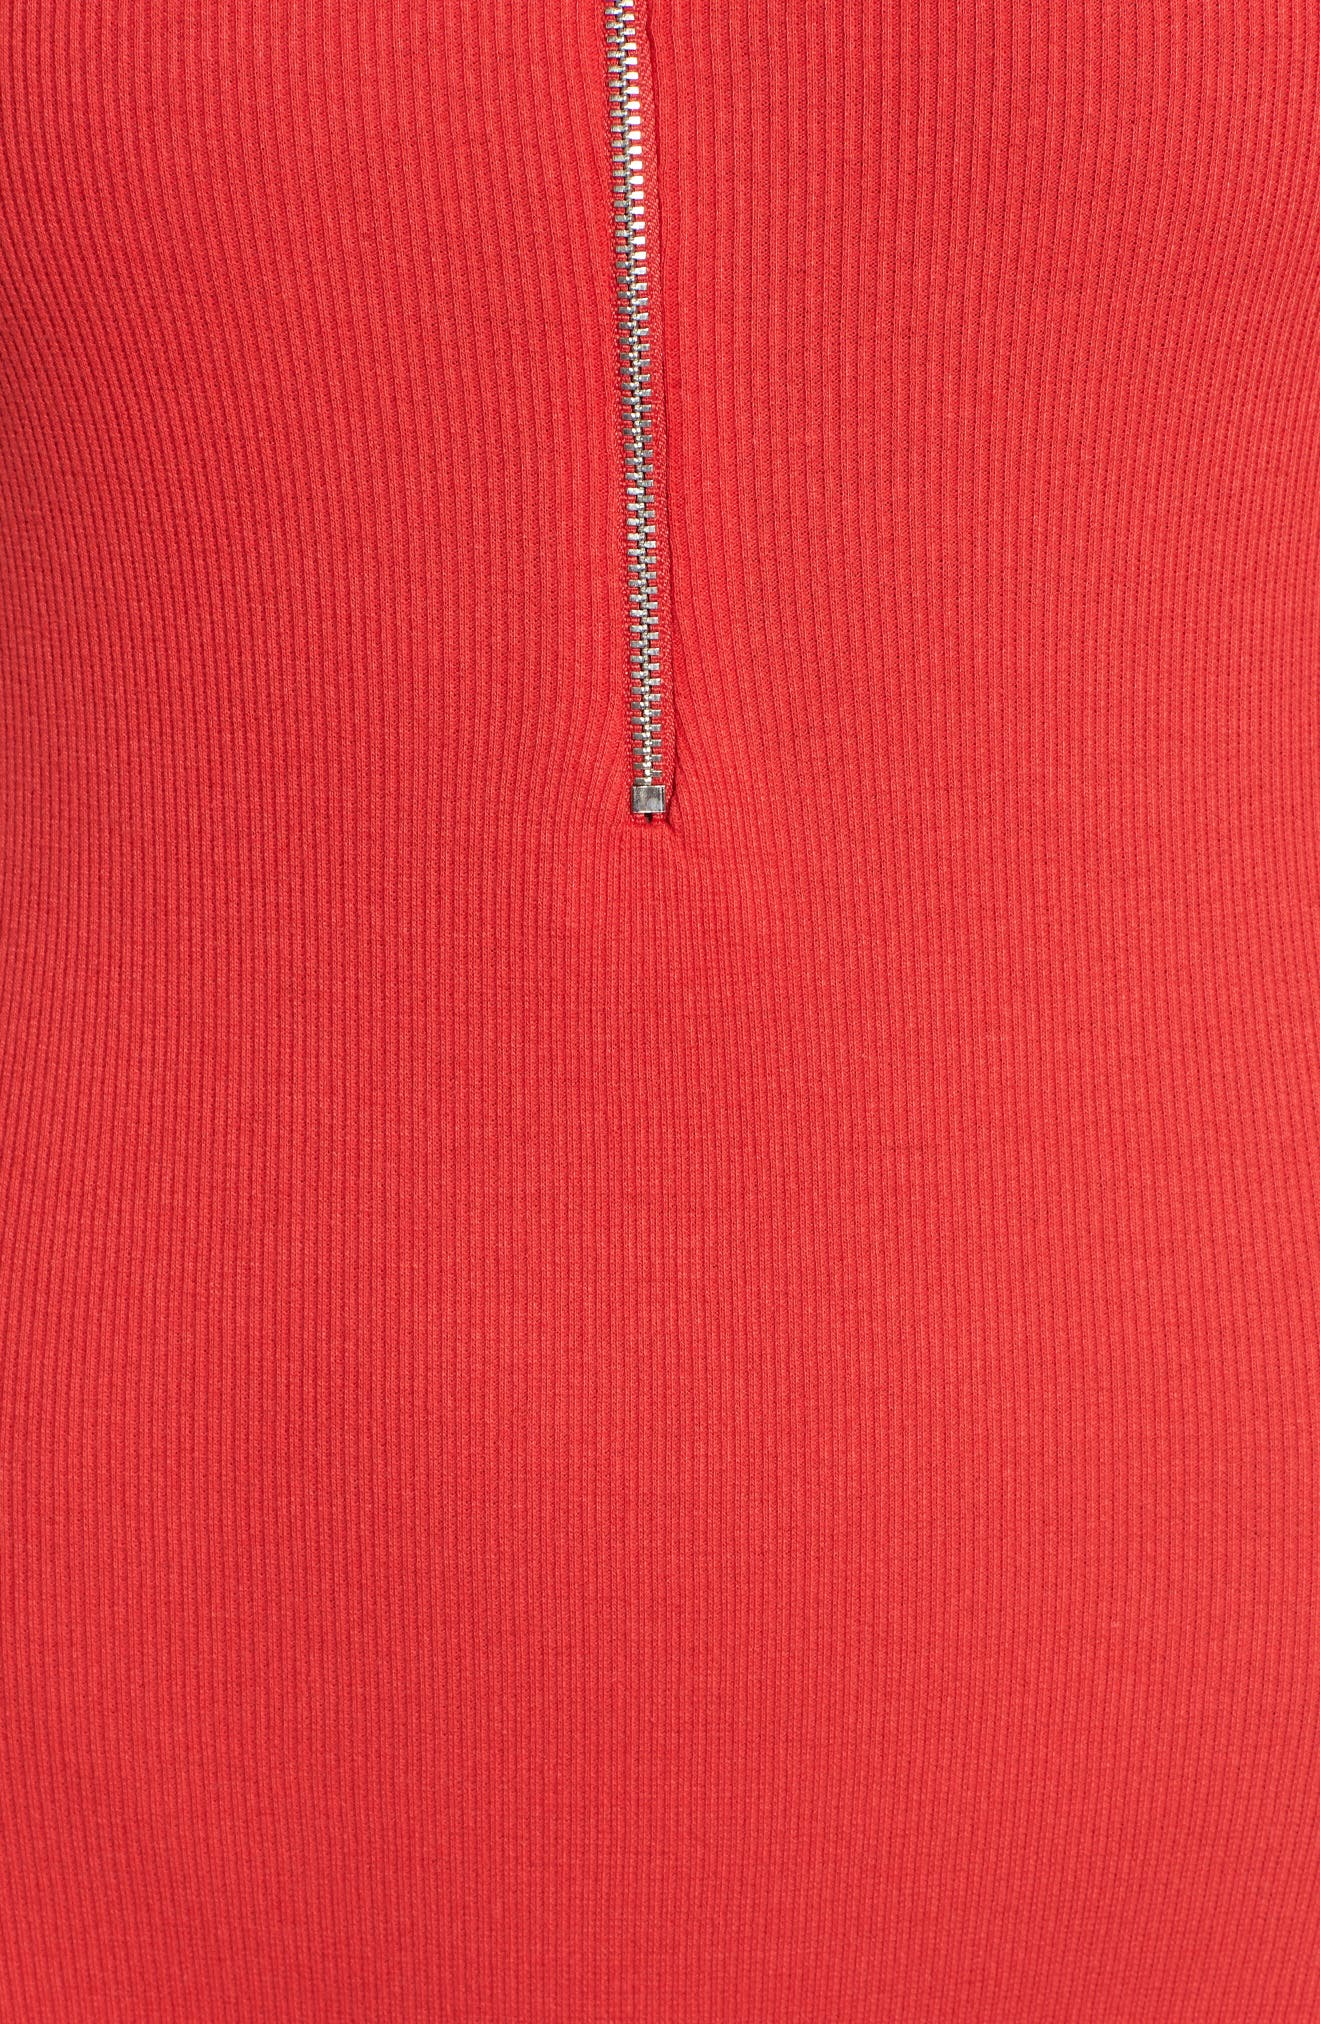 Ring Pull Zip Bodysuit,                             Alternate thumbnail 5, color,                             Red